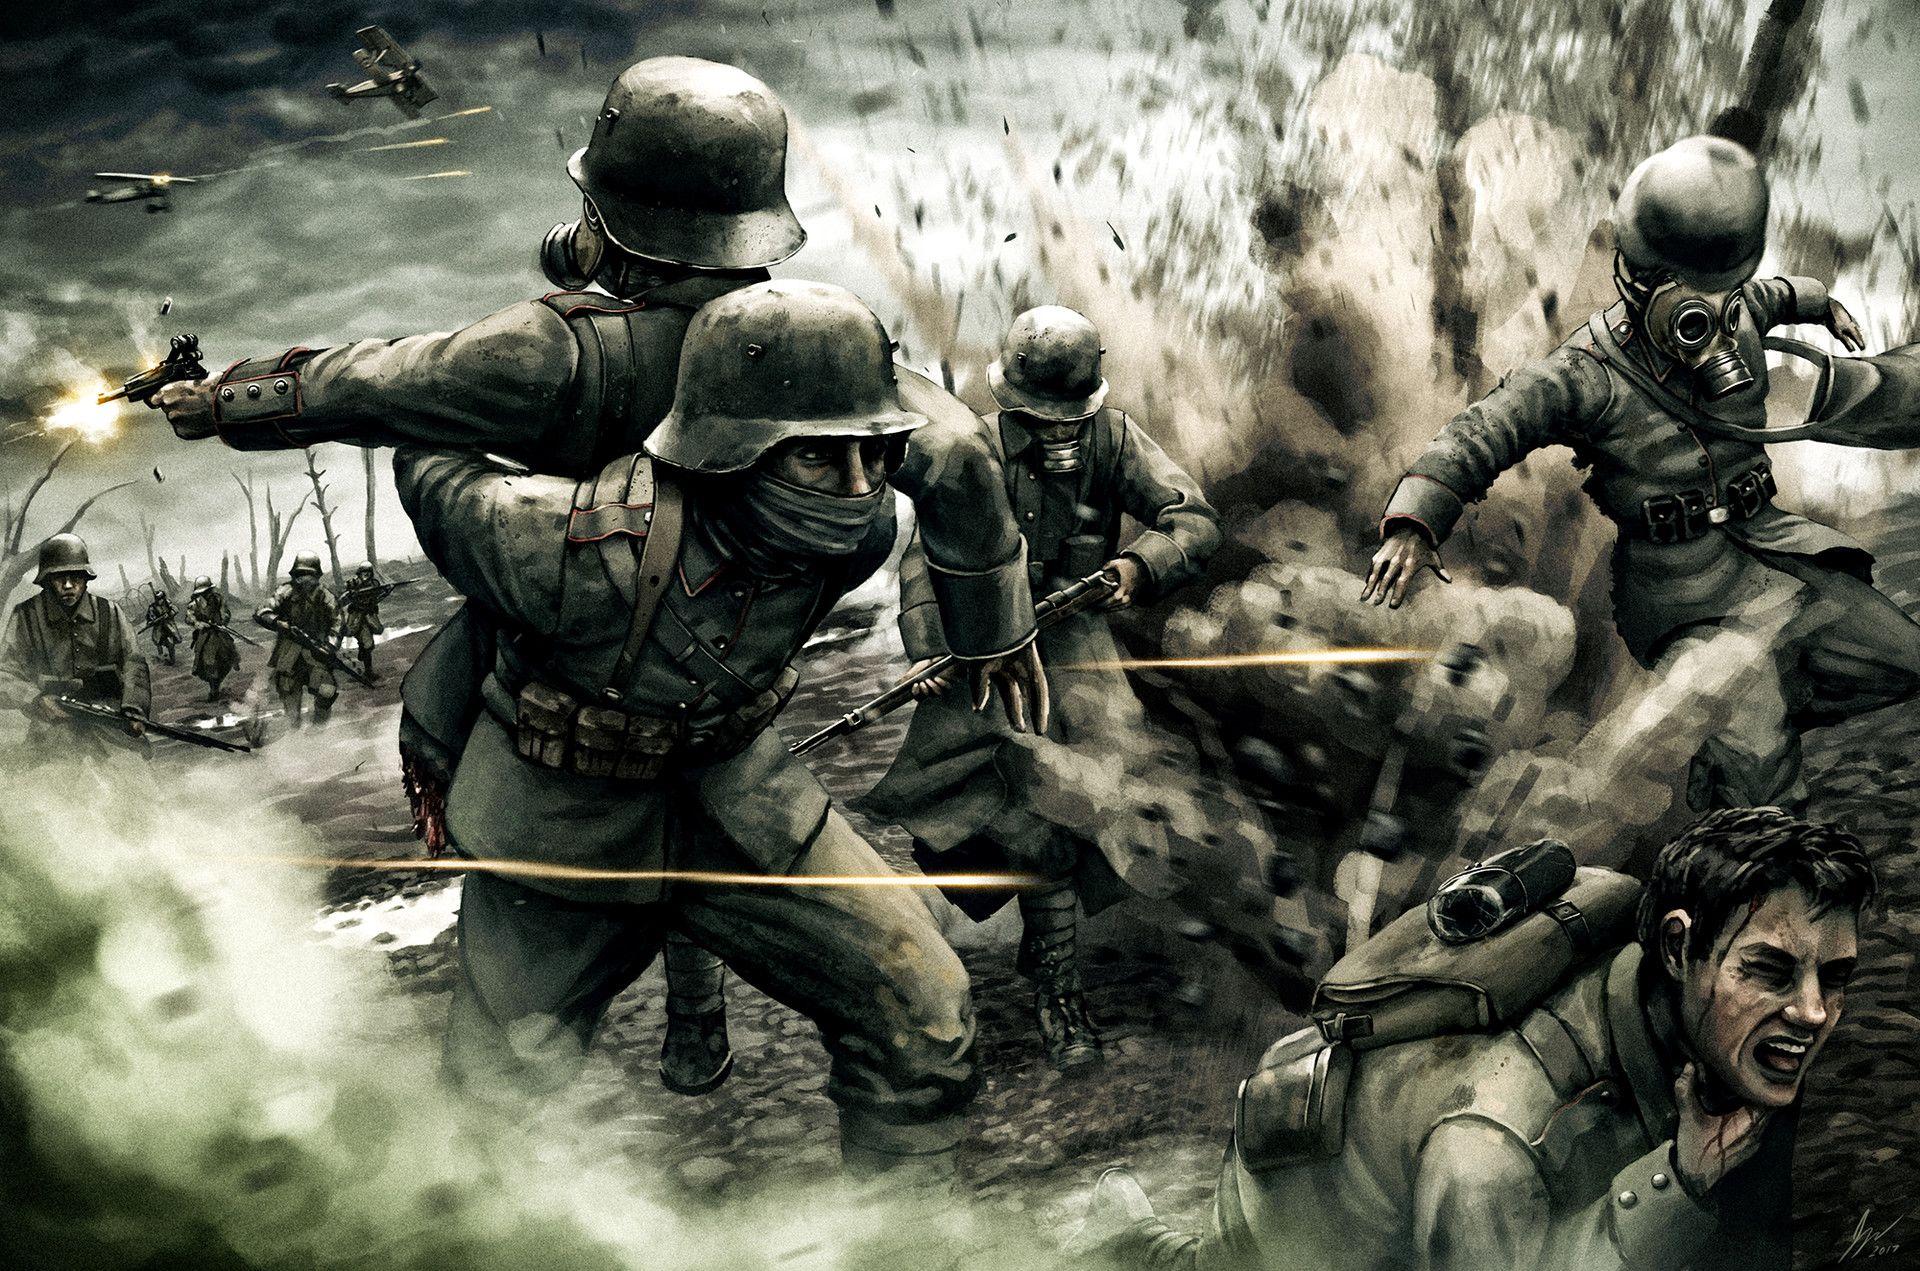 Military World War I Wars Battle Gas Mask War Hd Wallpaper B